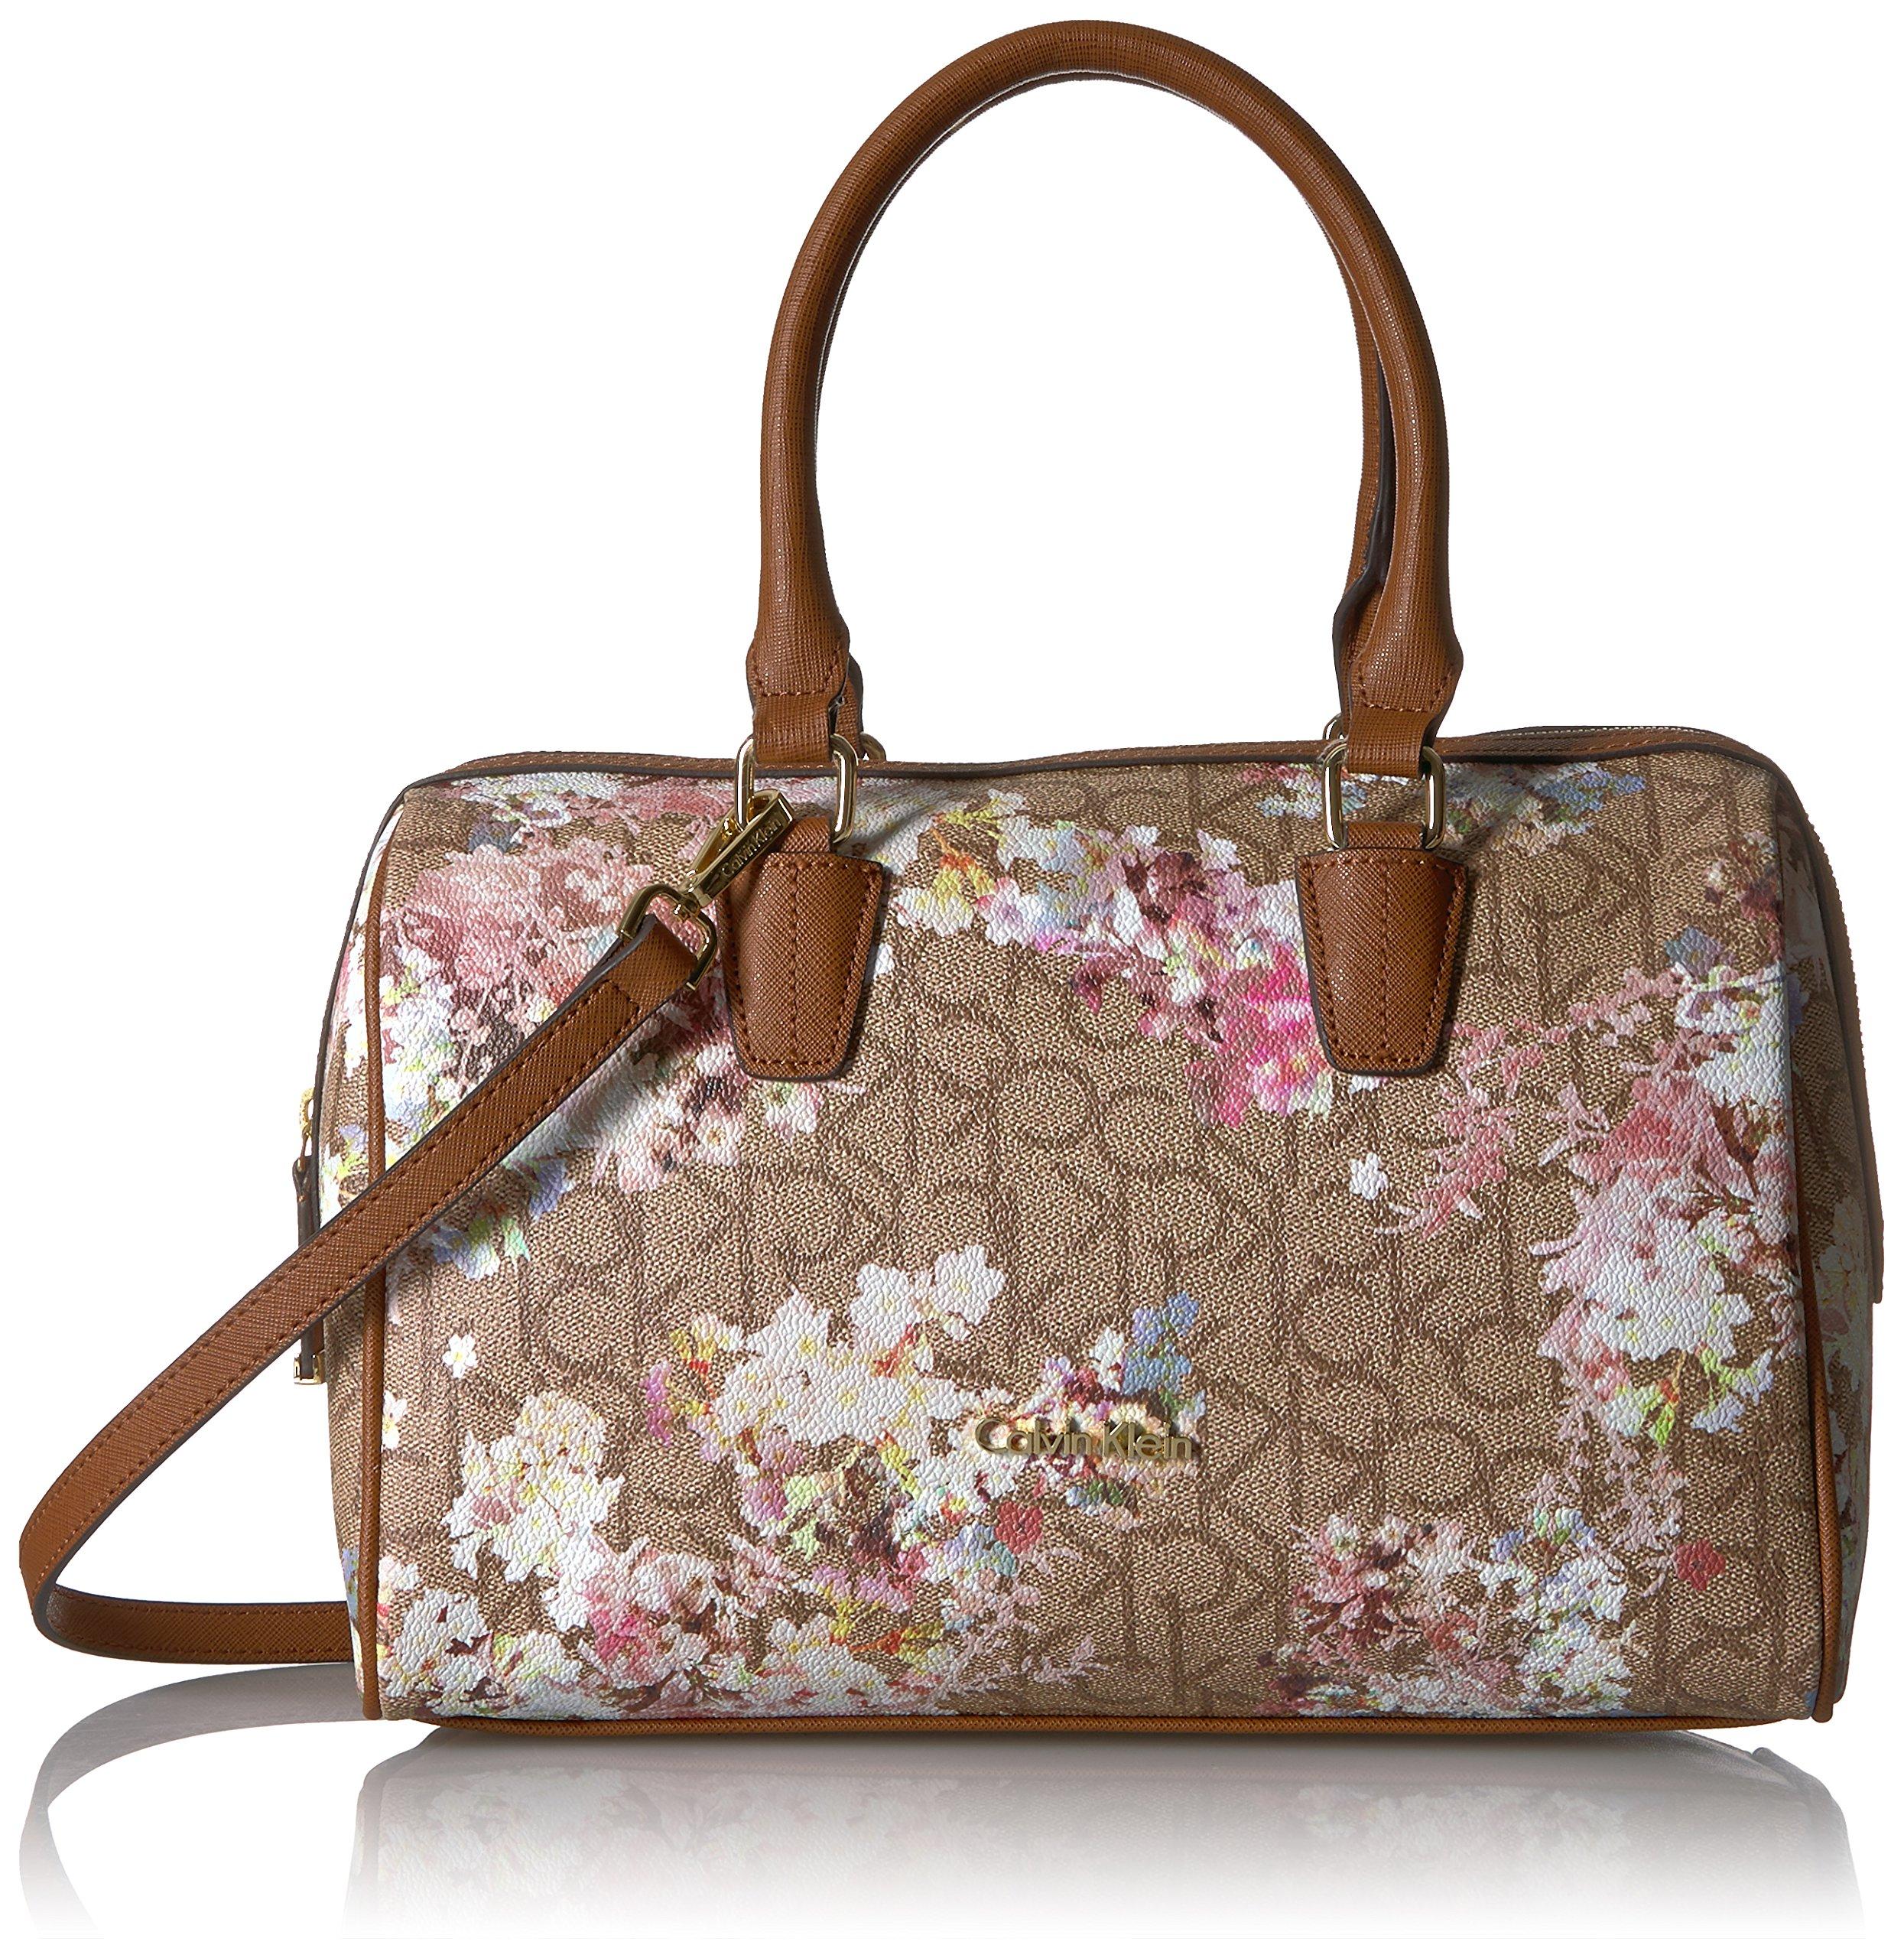 Calvin Klein Key Item Small Monogram Bowling Bag Satchel, Txt Khaki/Brown/Floral by Calvin Klein